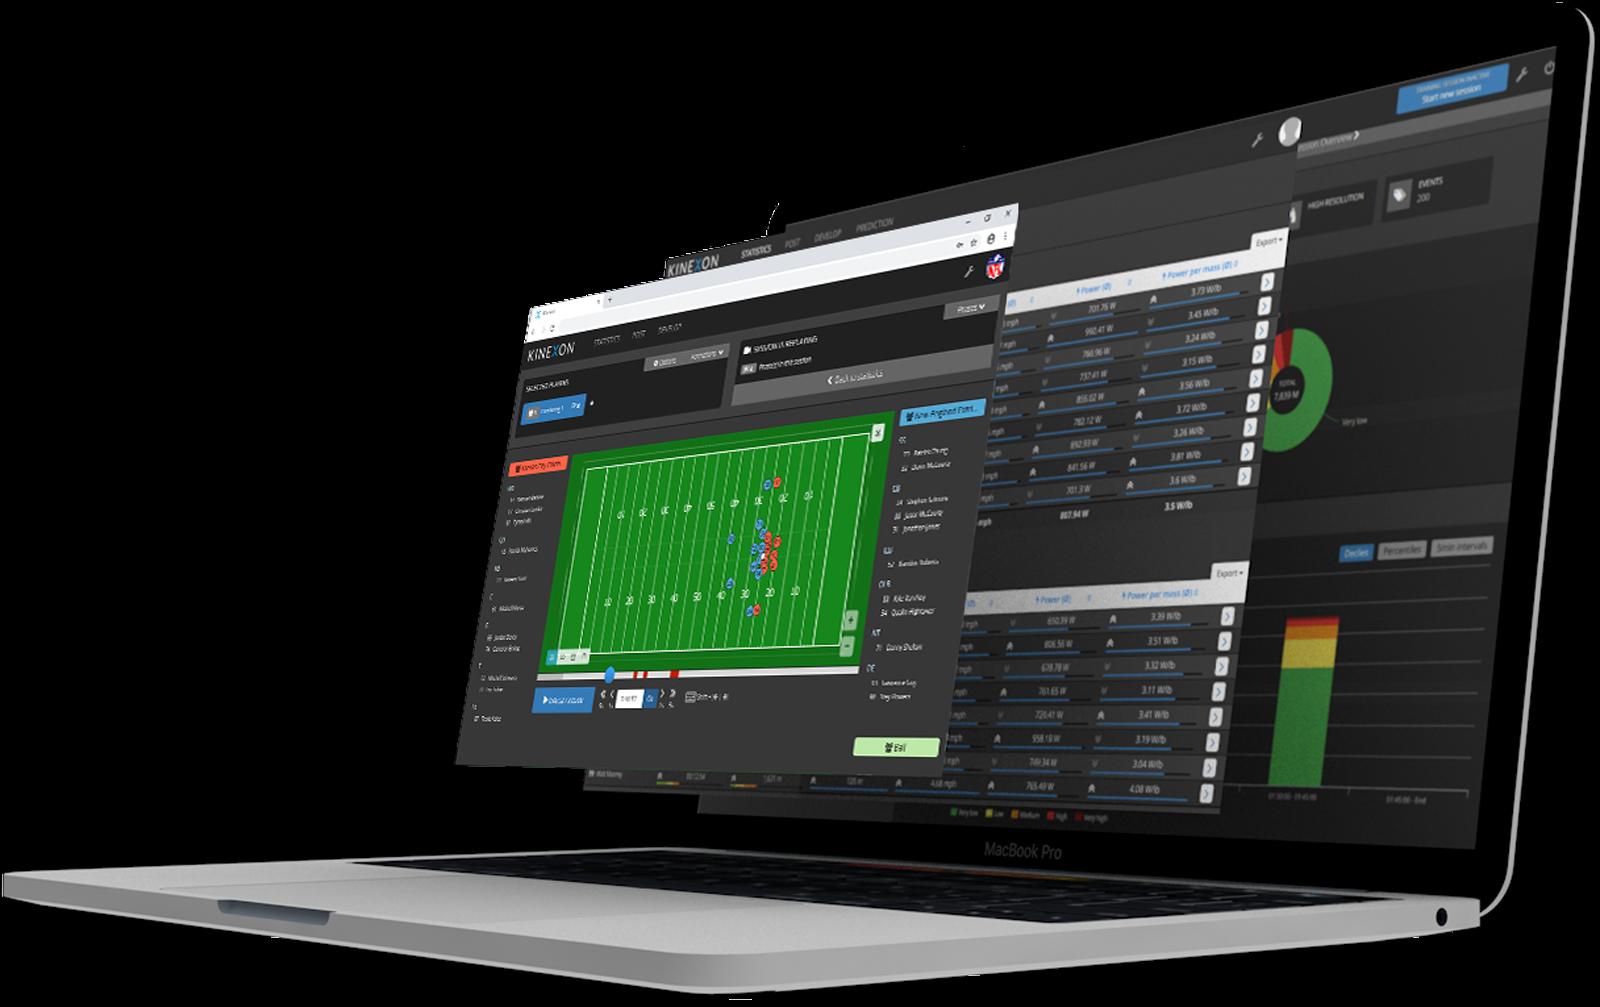 Macbook mockup Football website